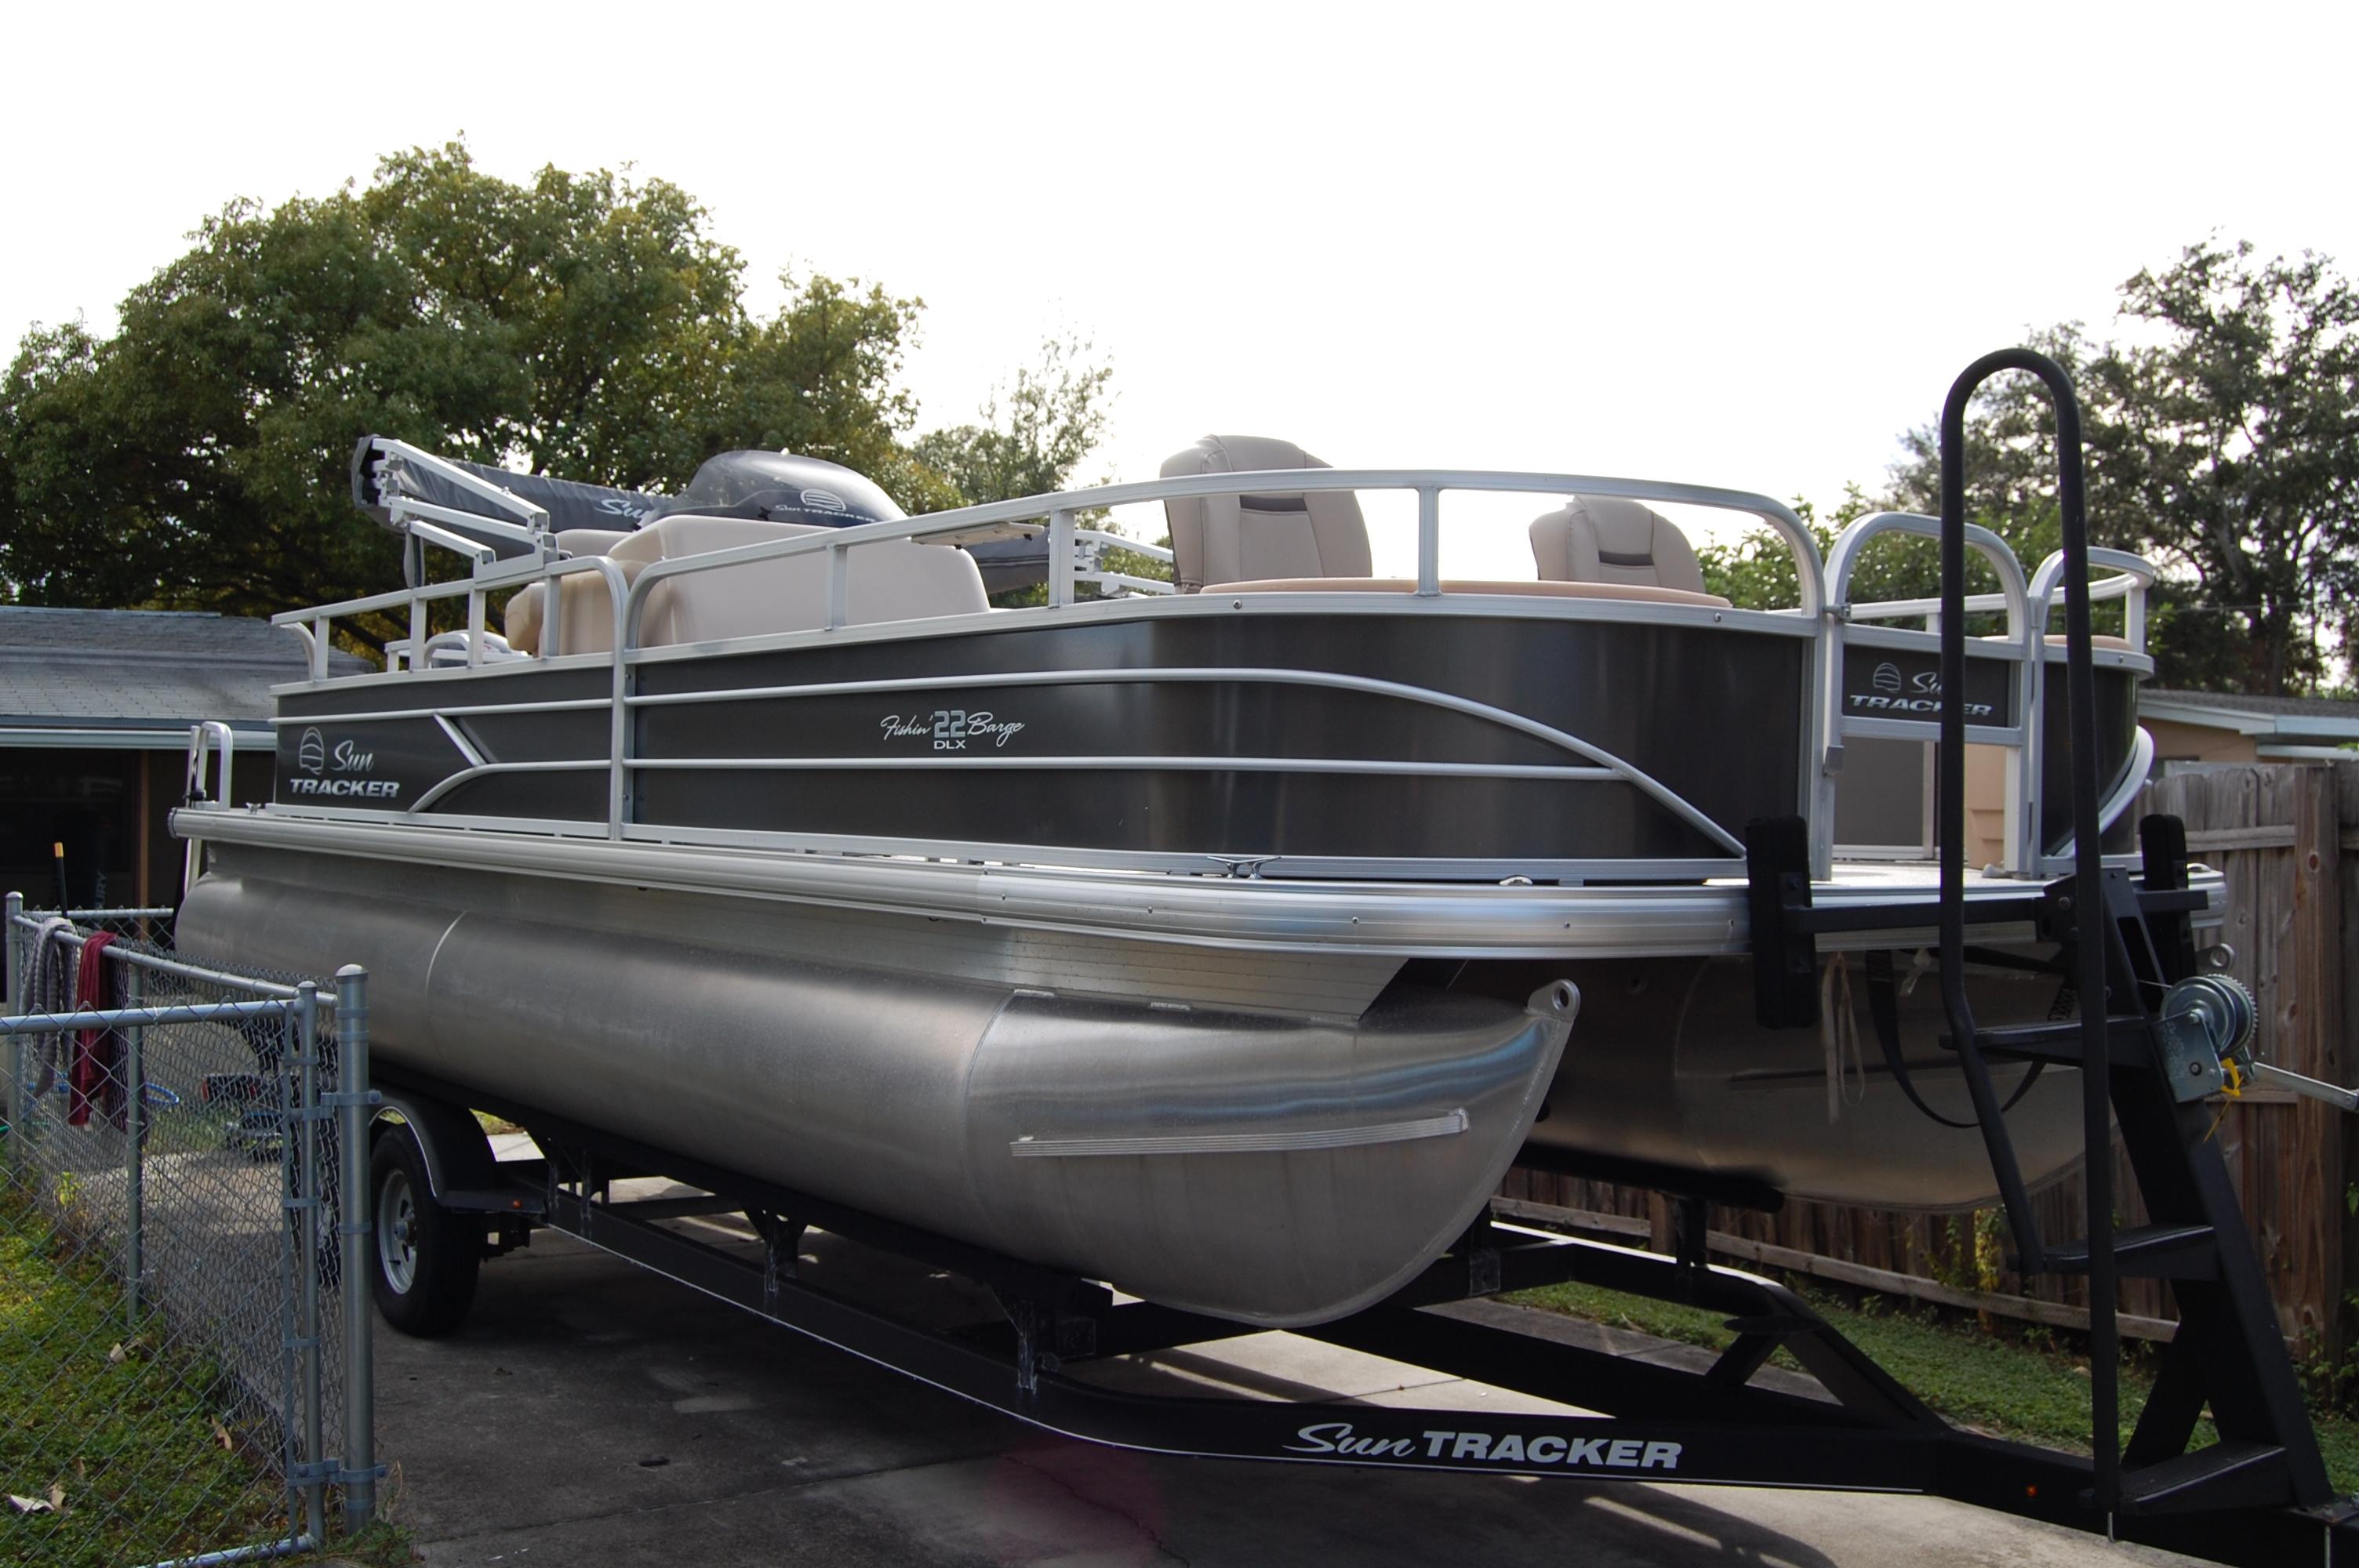 Sun Tracker 22 Fishing Barge 22 DLX